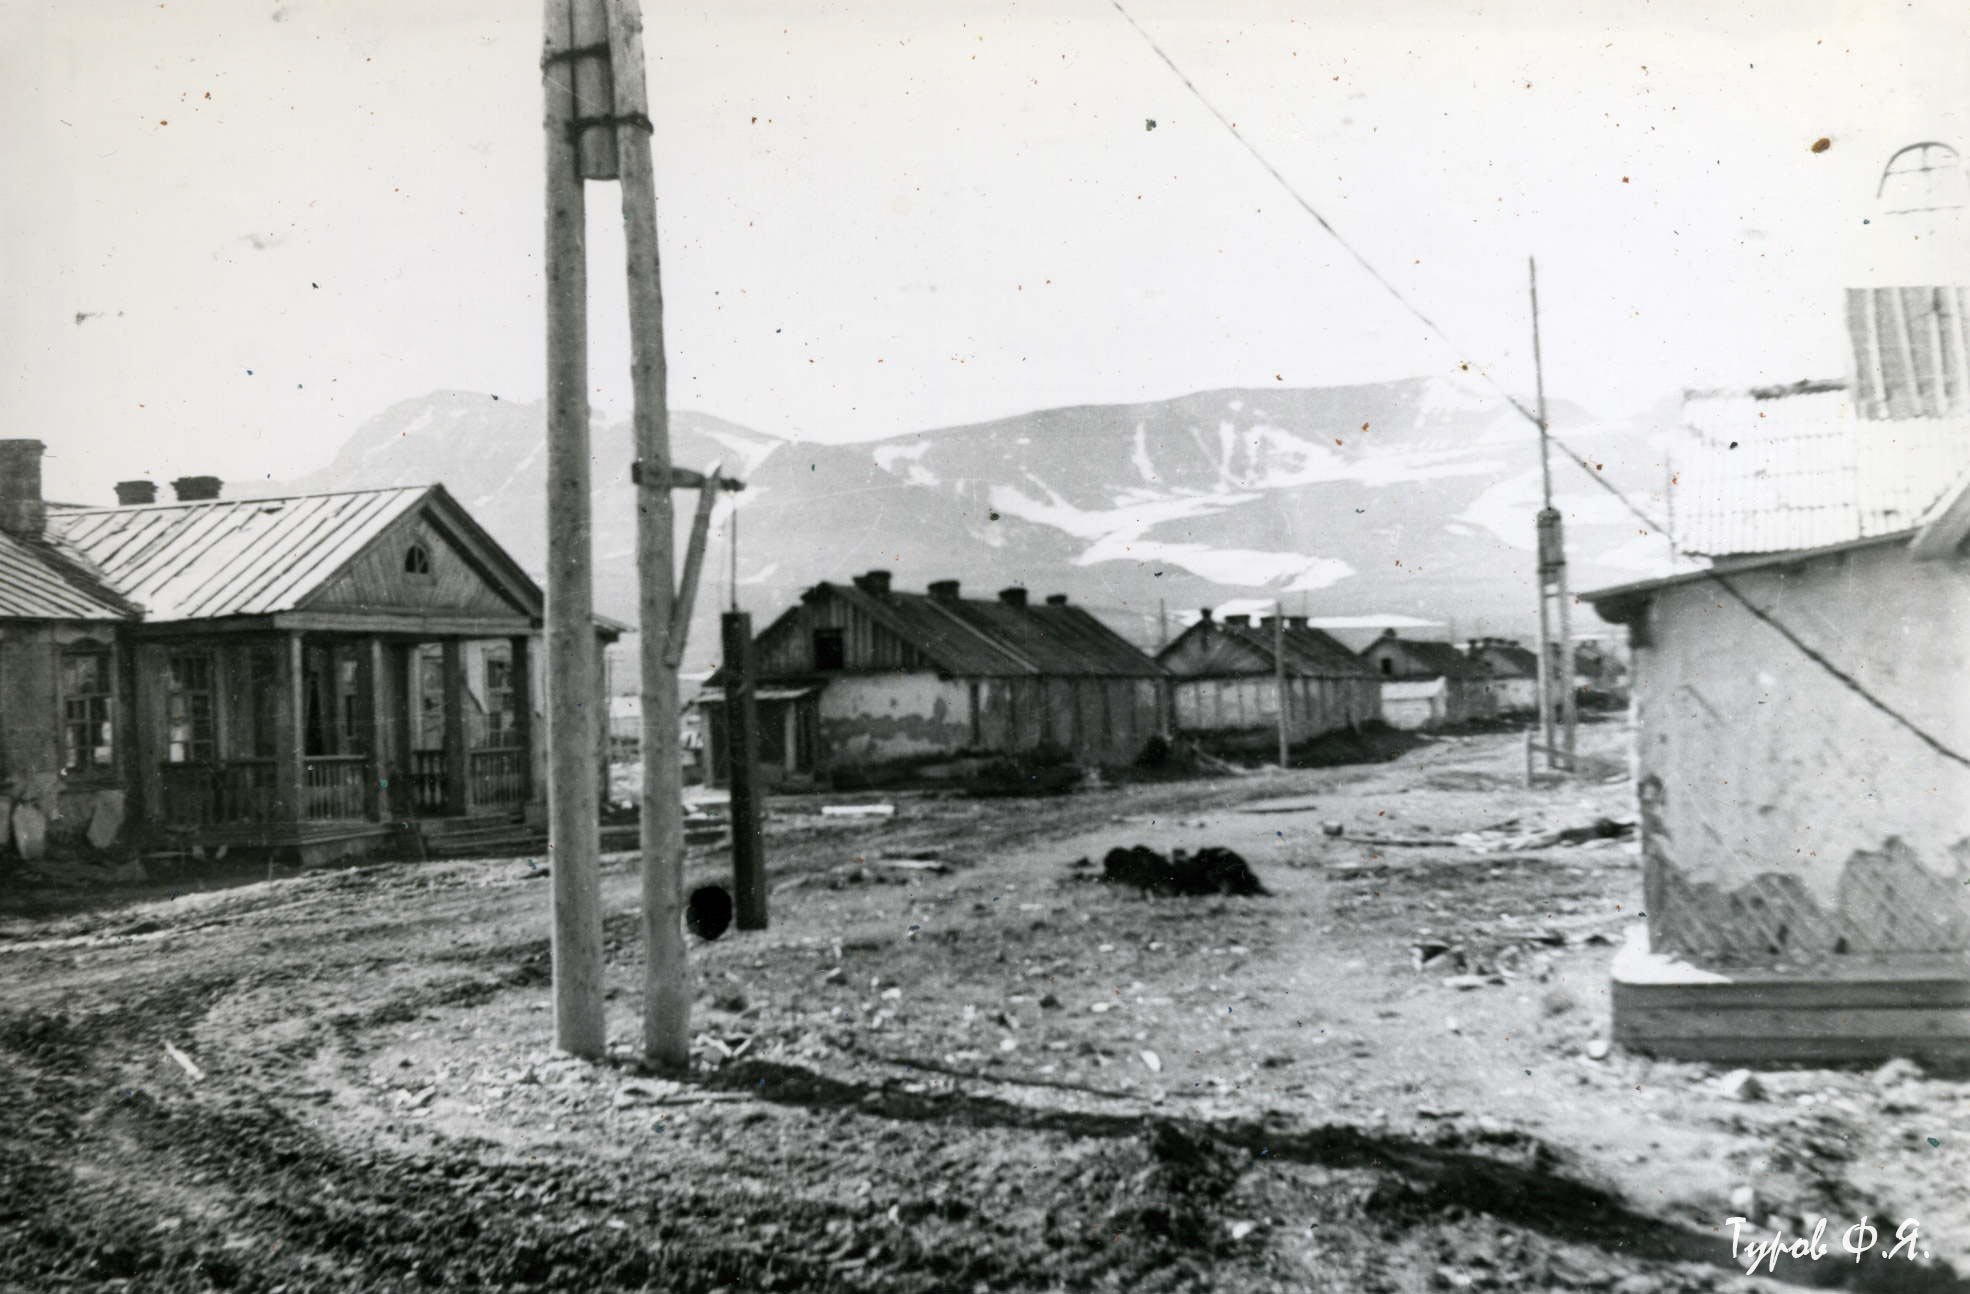 Центральная улица 106 км (Полярный) в 1962